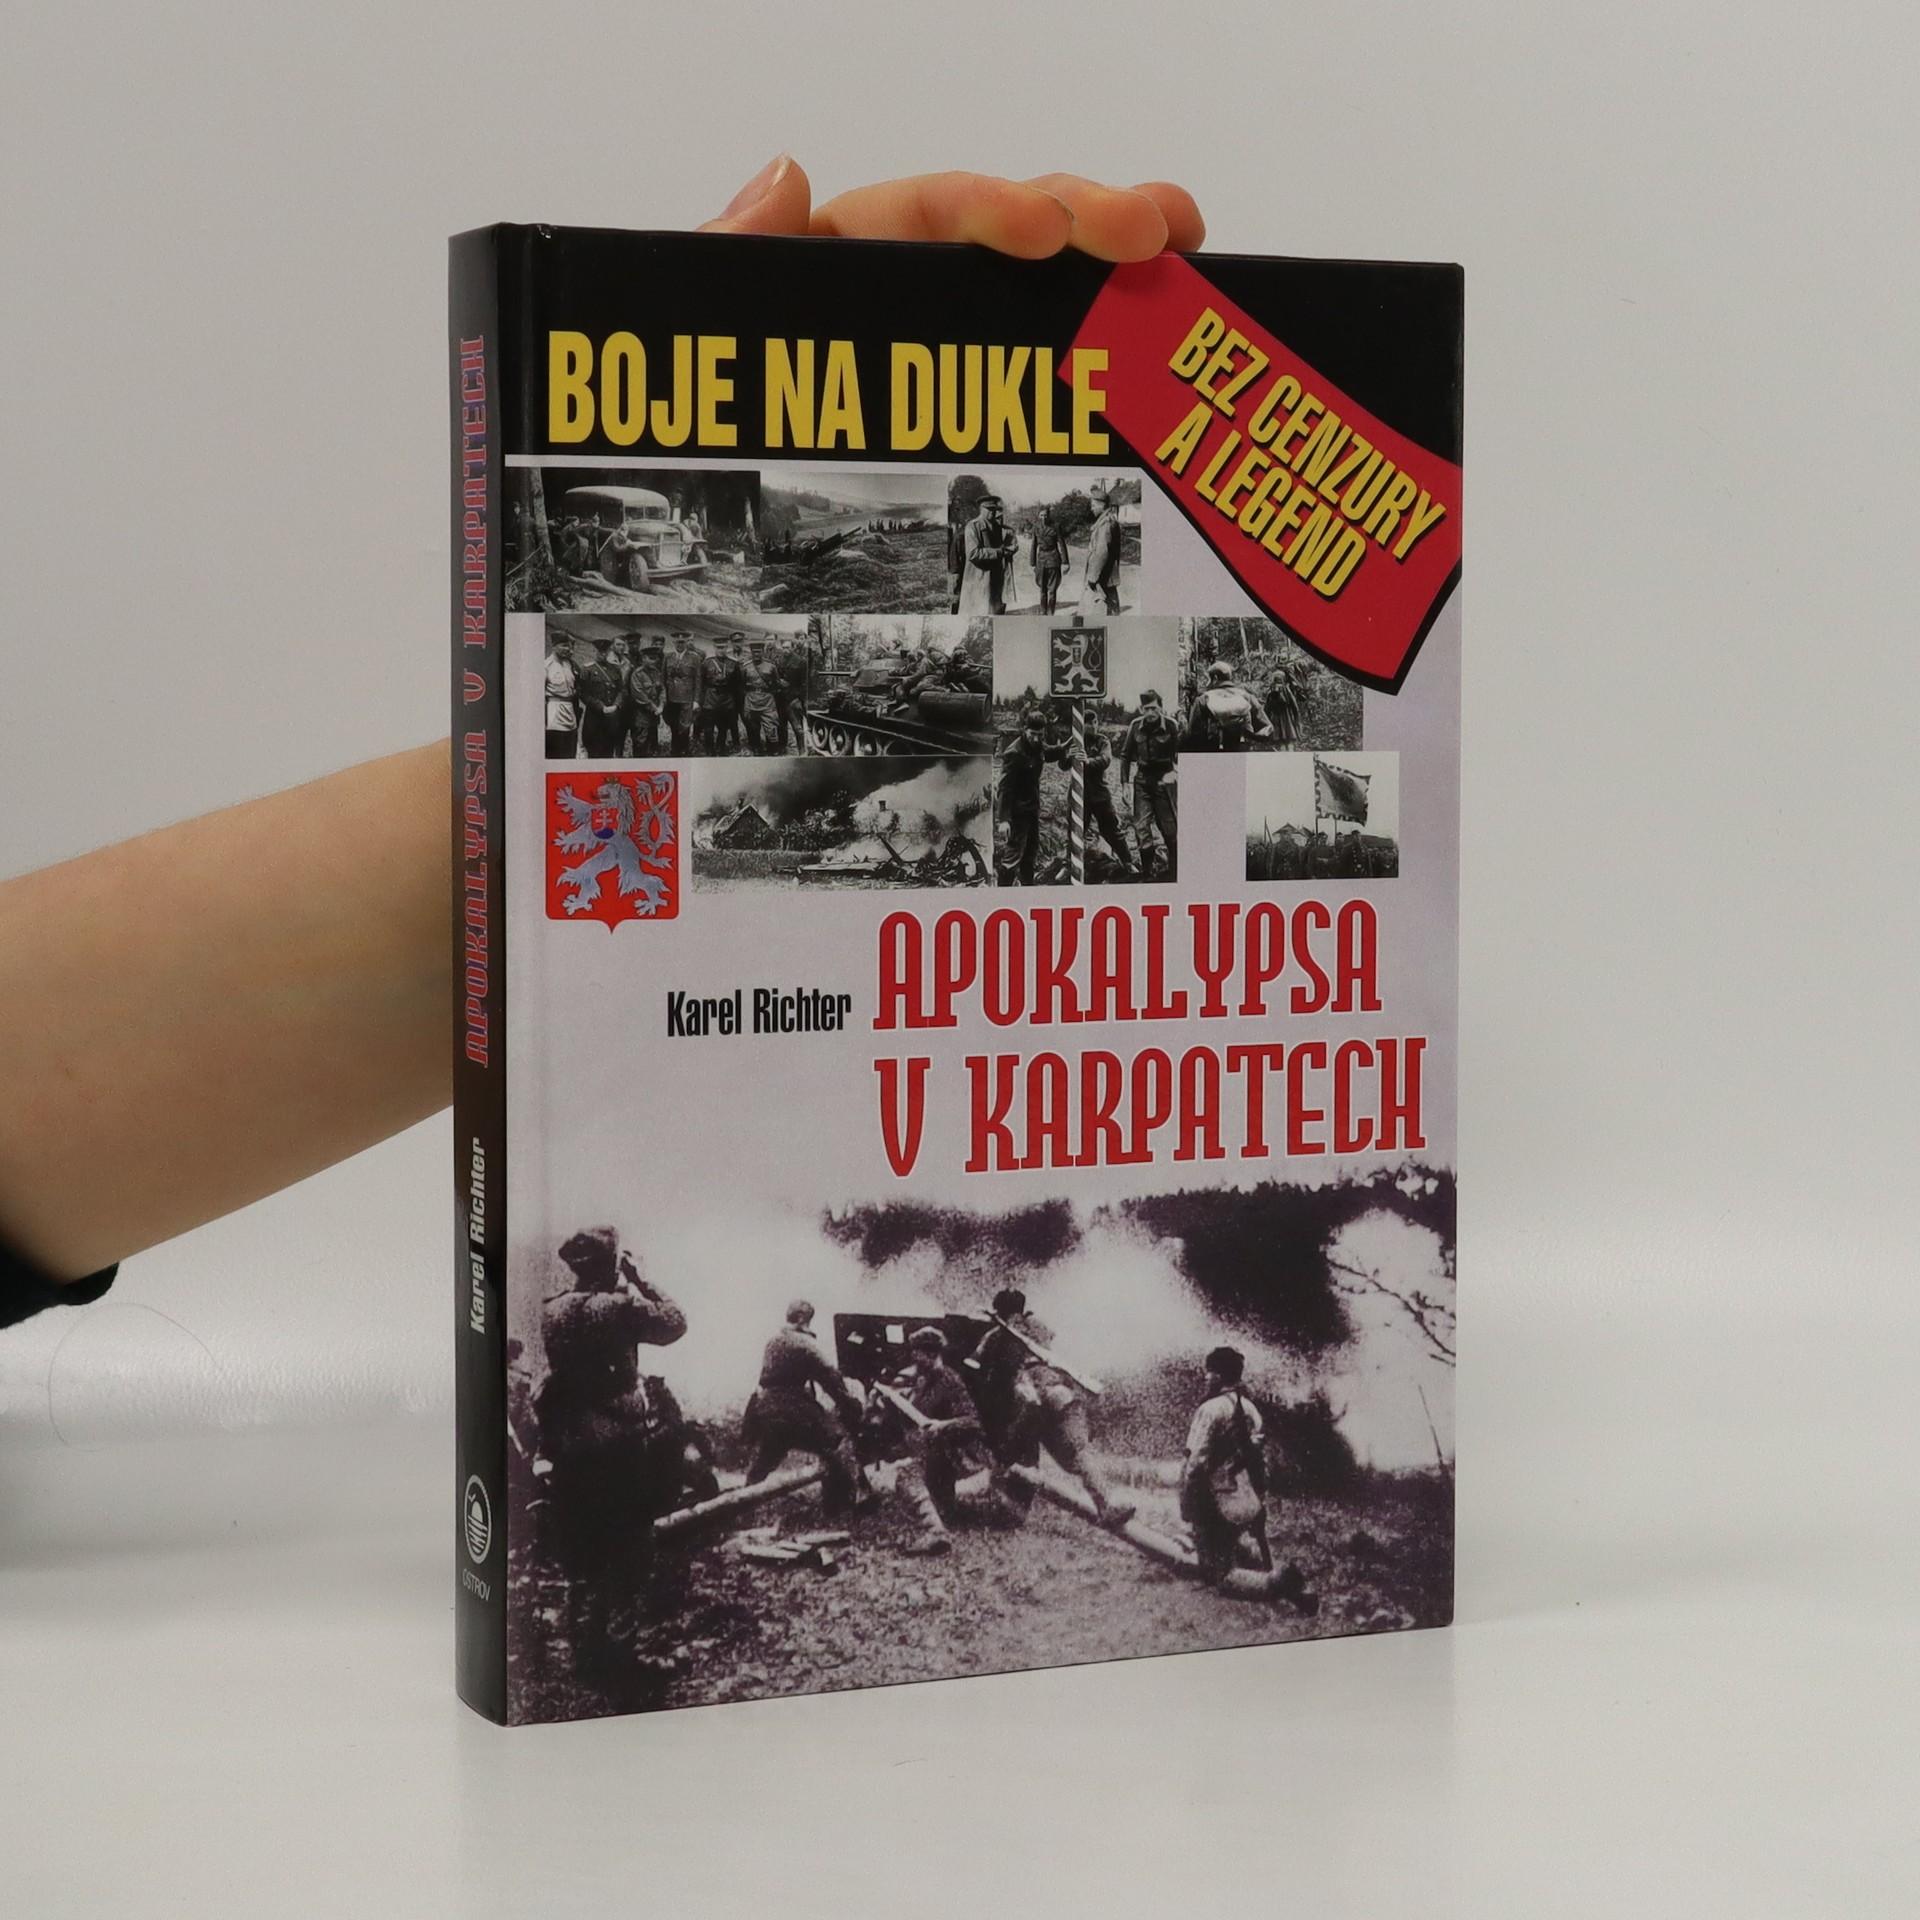 antikvární kniha Apokalypsa v Karpatech : Boje na Dukle bez cenzury a legend, 2003